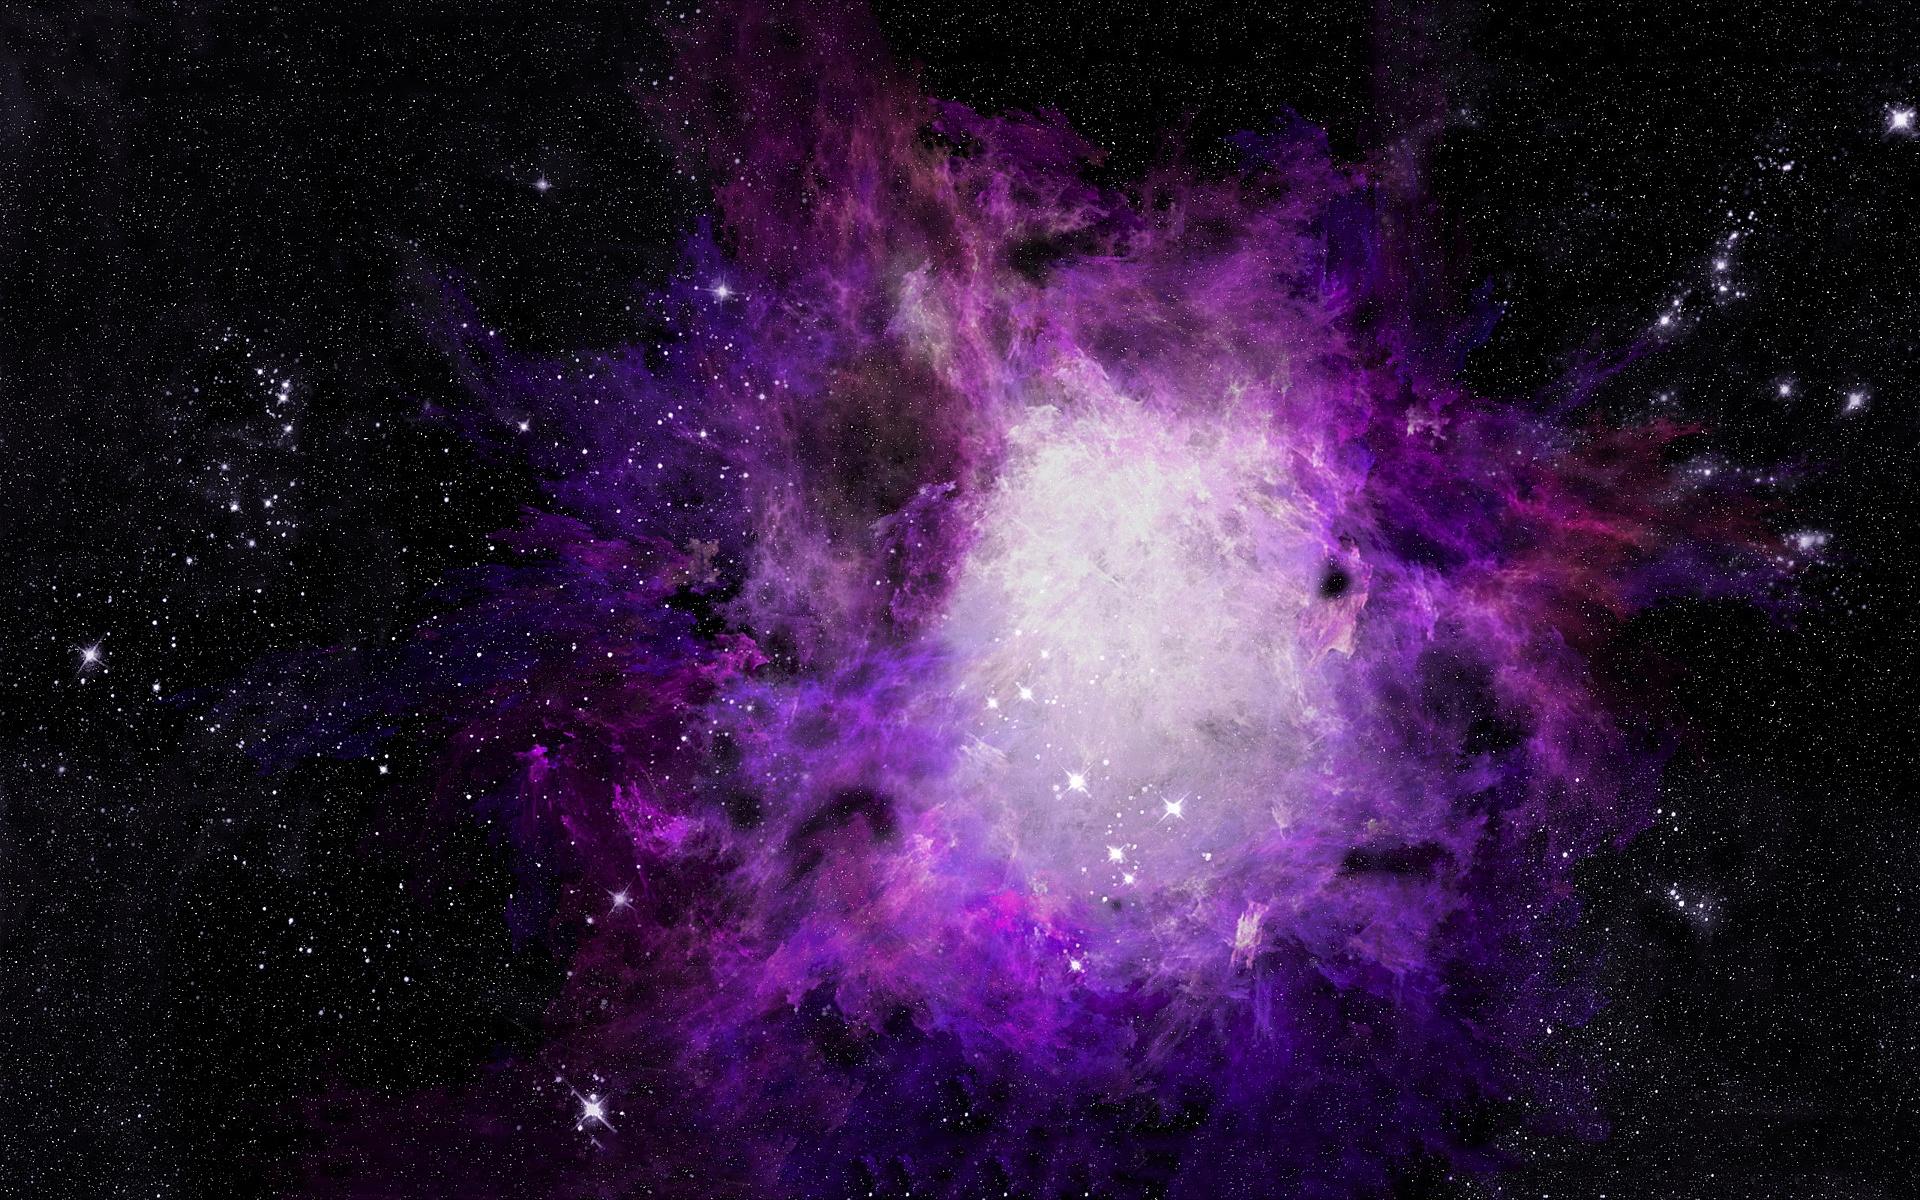 Widescreen Nebula 24 Cool Hd Wallpaper   Hivewallpapercom 1920x1200